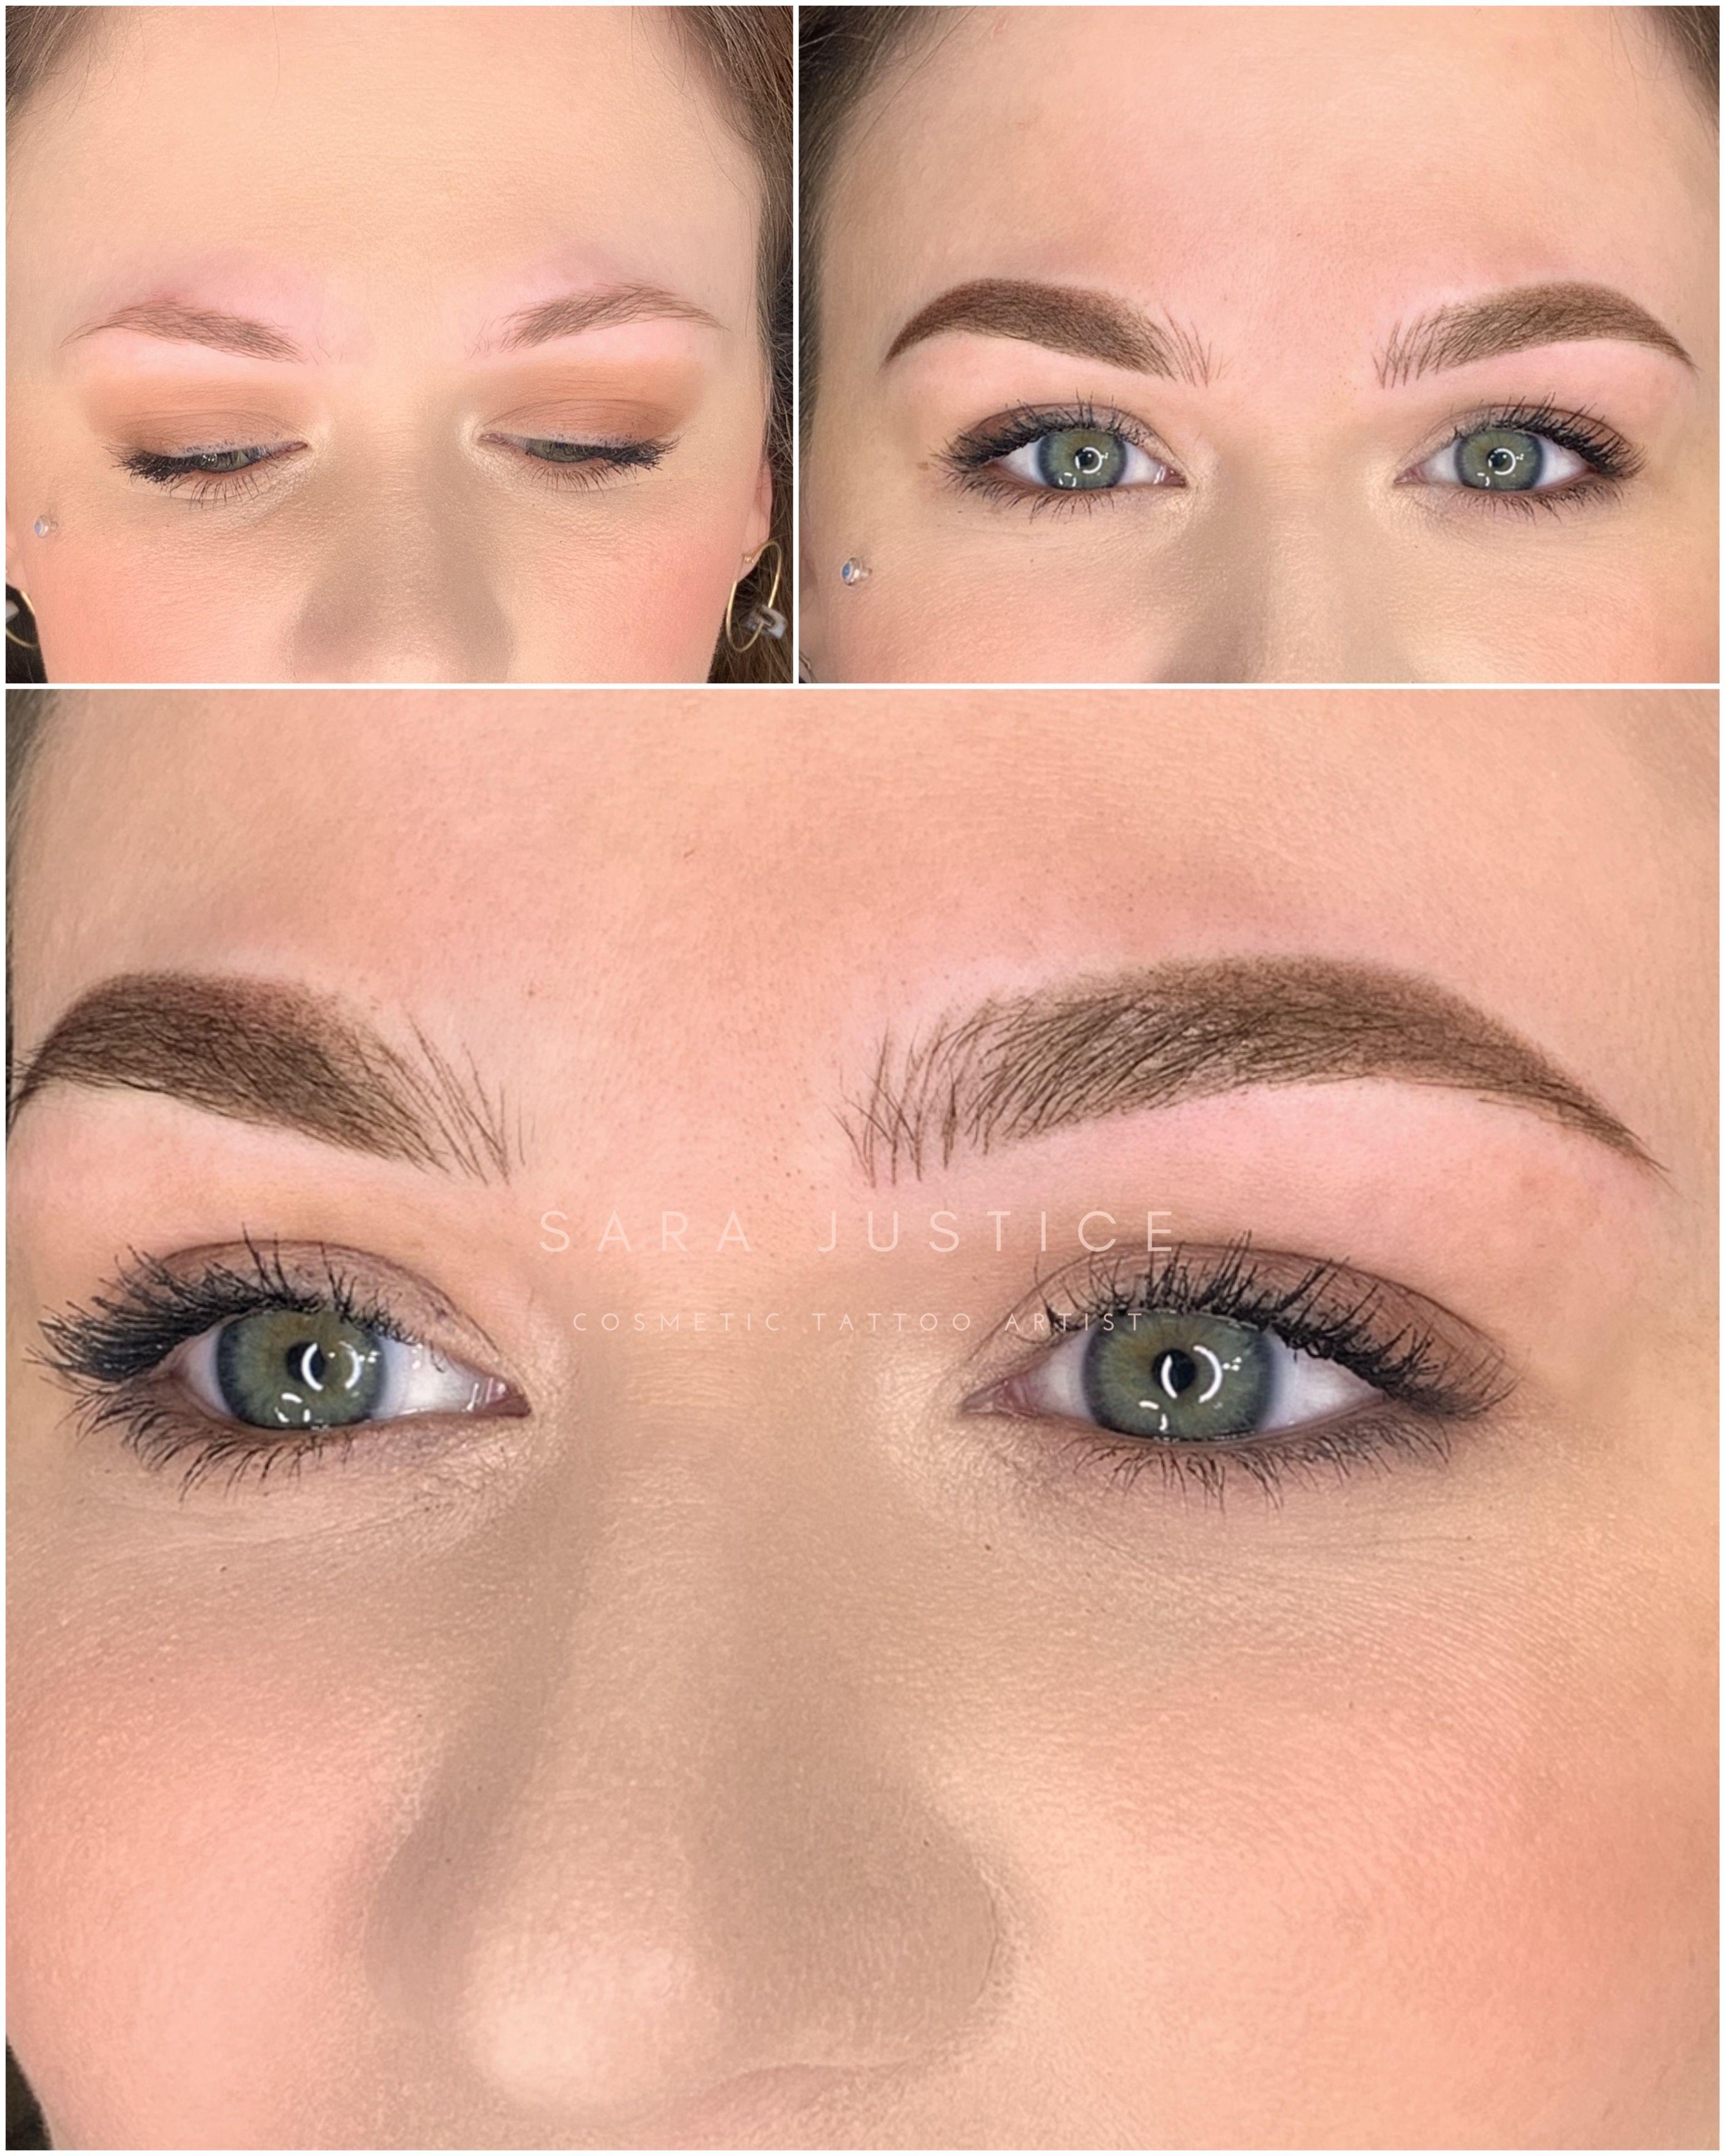 3d eyebrow tattoo in fulton county ga in 2020 eyebrows